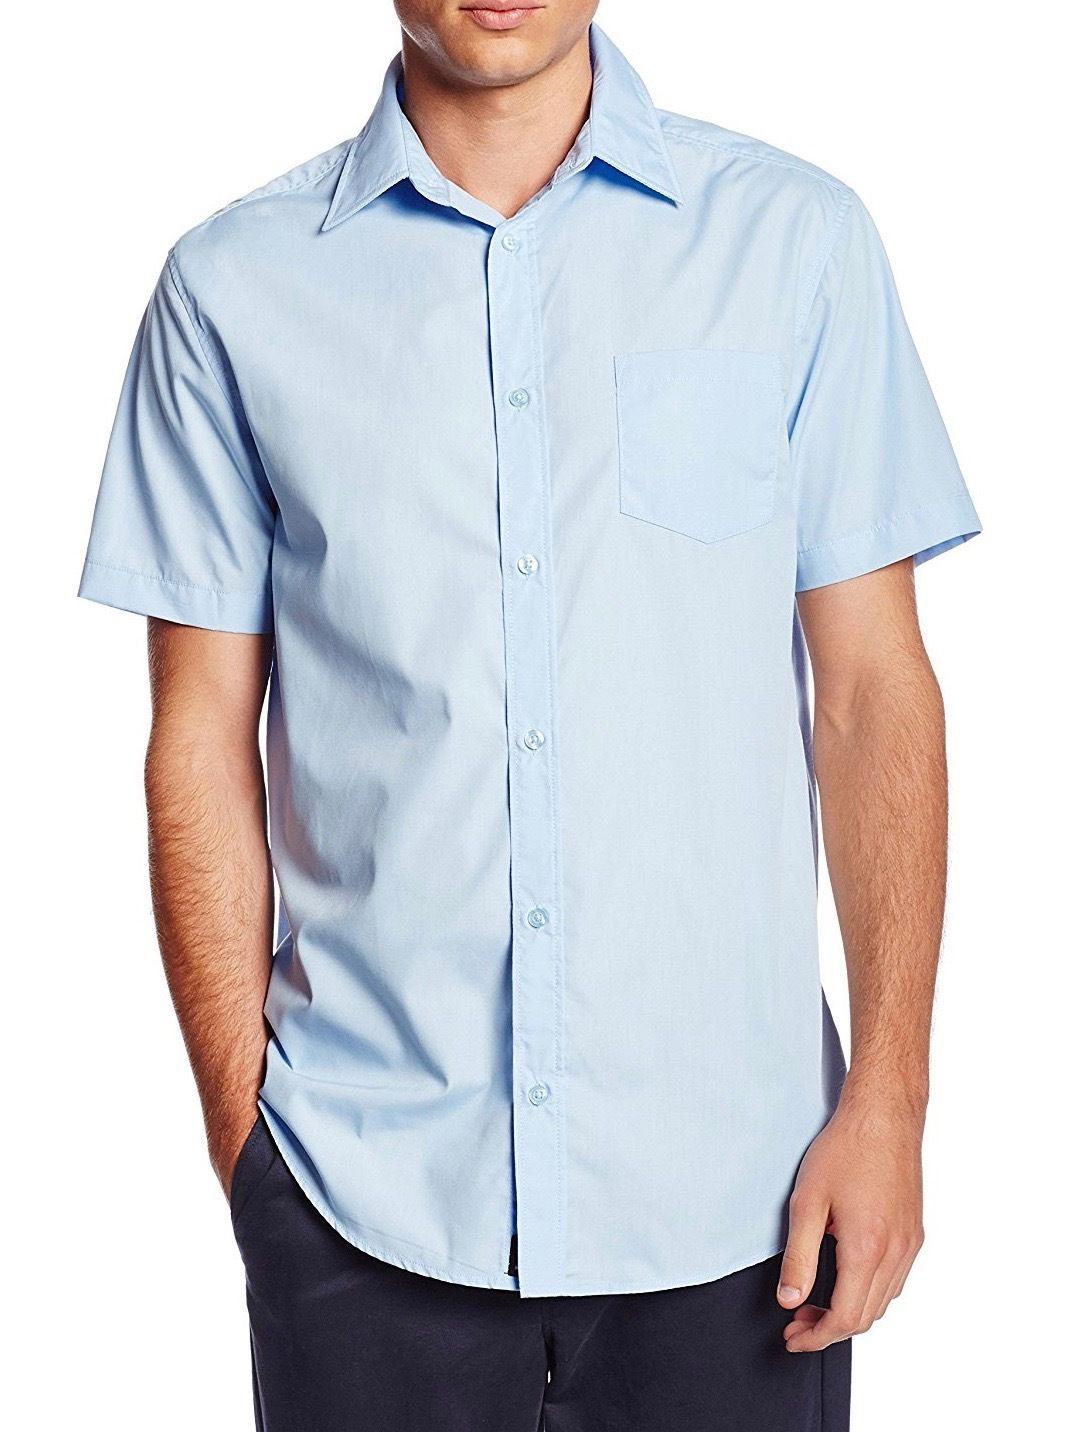 Berlioni-Italy-Men-039-s-Premium-Classic-Button-Down-Short-Sleeve-Solid-Dress-Shirt thumbnail 6